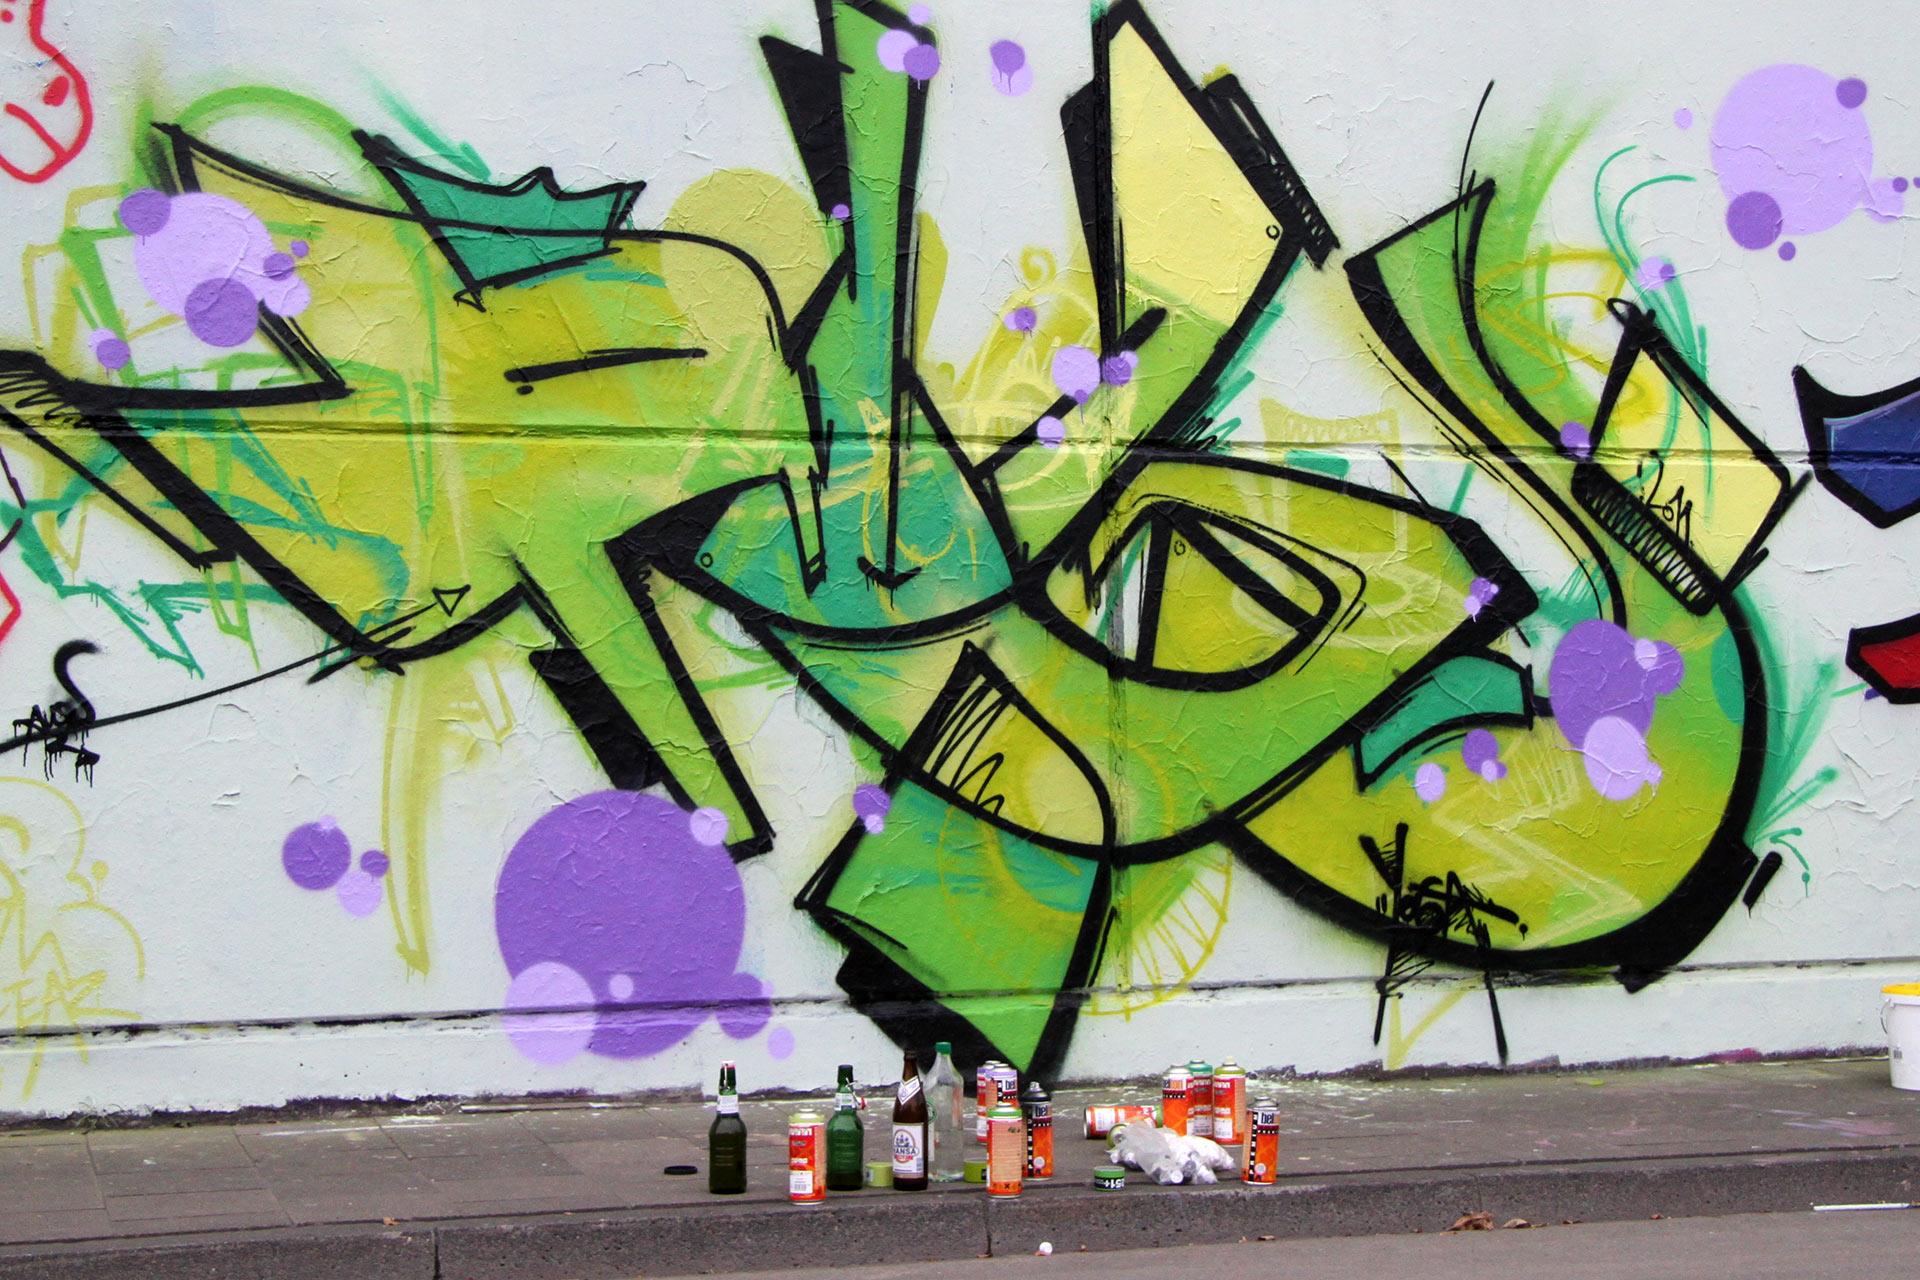 Auckz, Graffiti, Münster, Freie Arbeiten, Spray, Urban, Studio Auckz